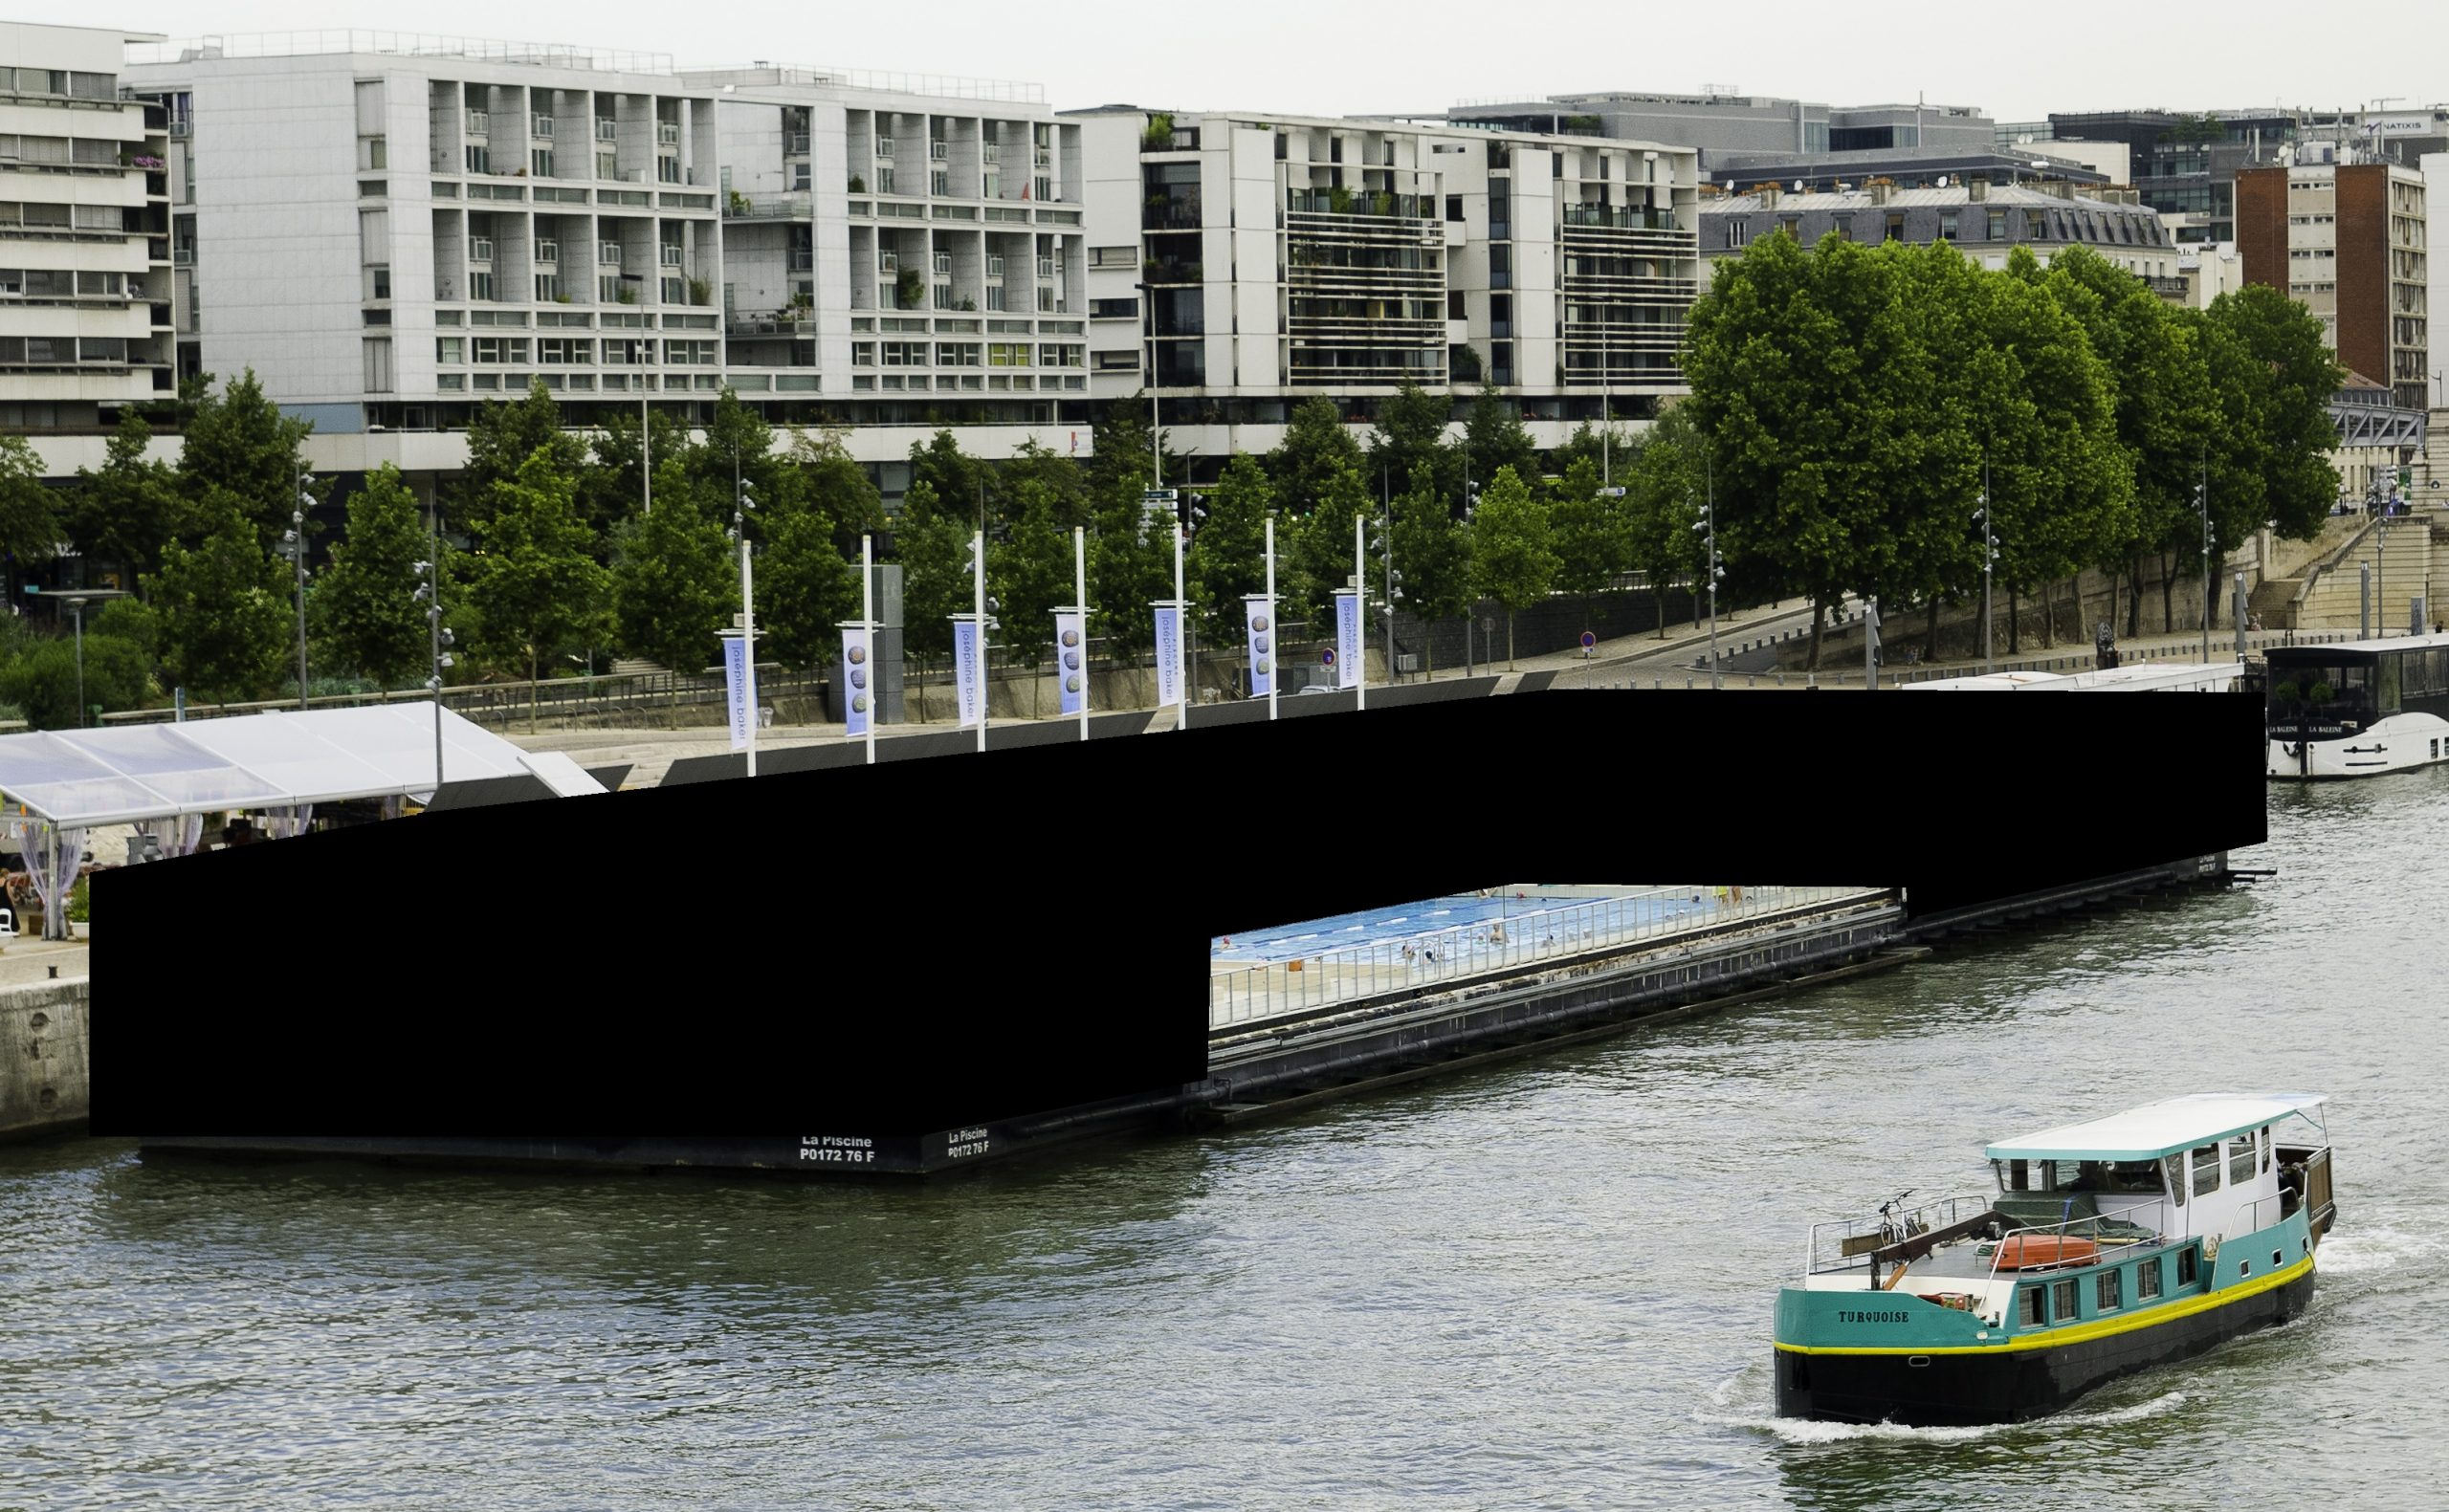 File:piscine Joséphine Baker Ouverte Paris.jpg - Wikimedia ... concernant Piscine 13Eme